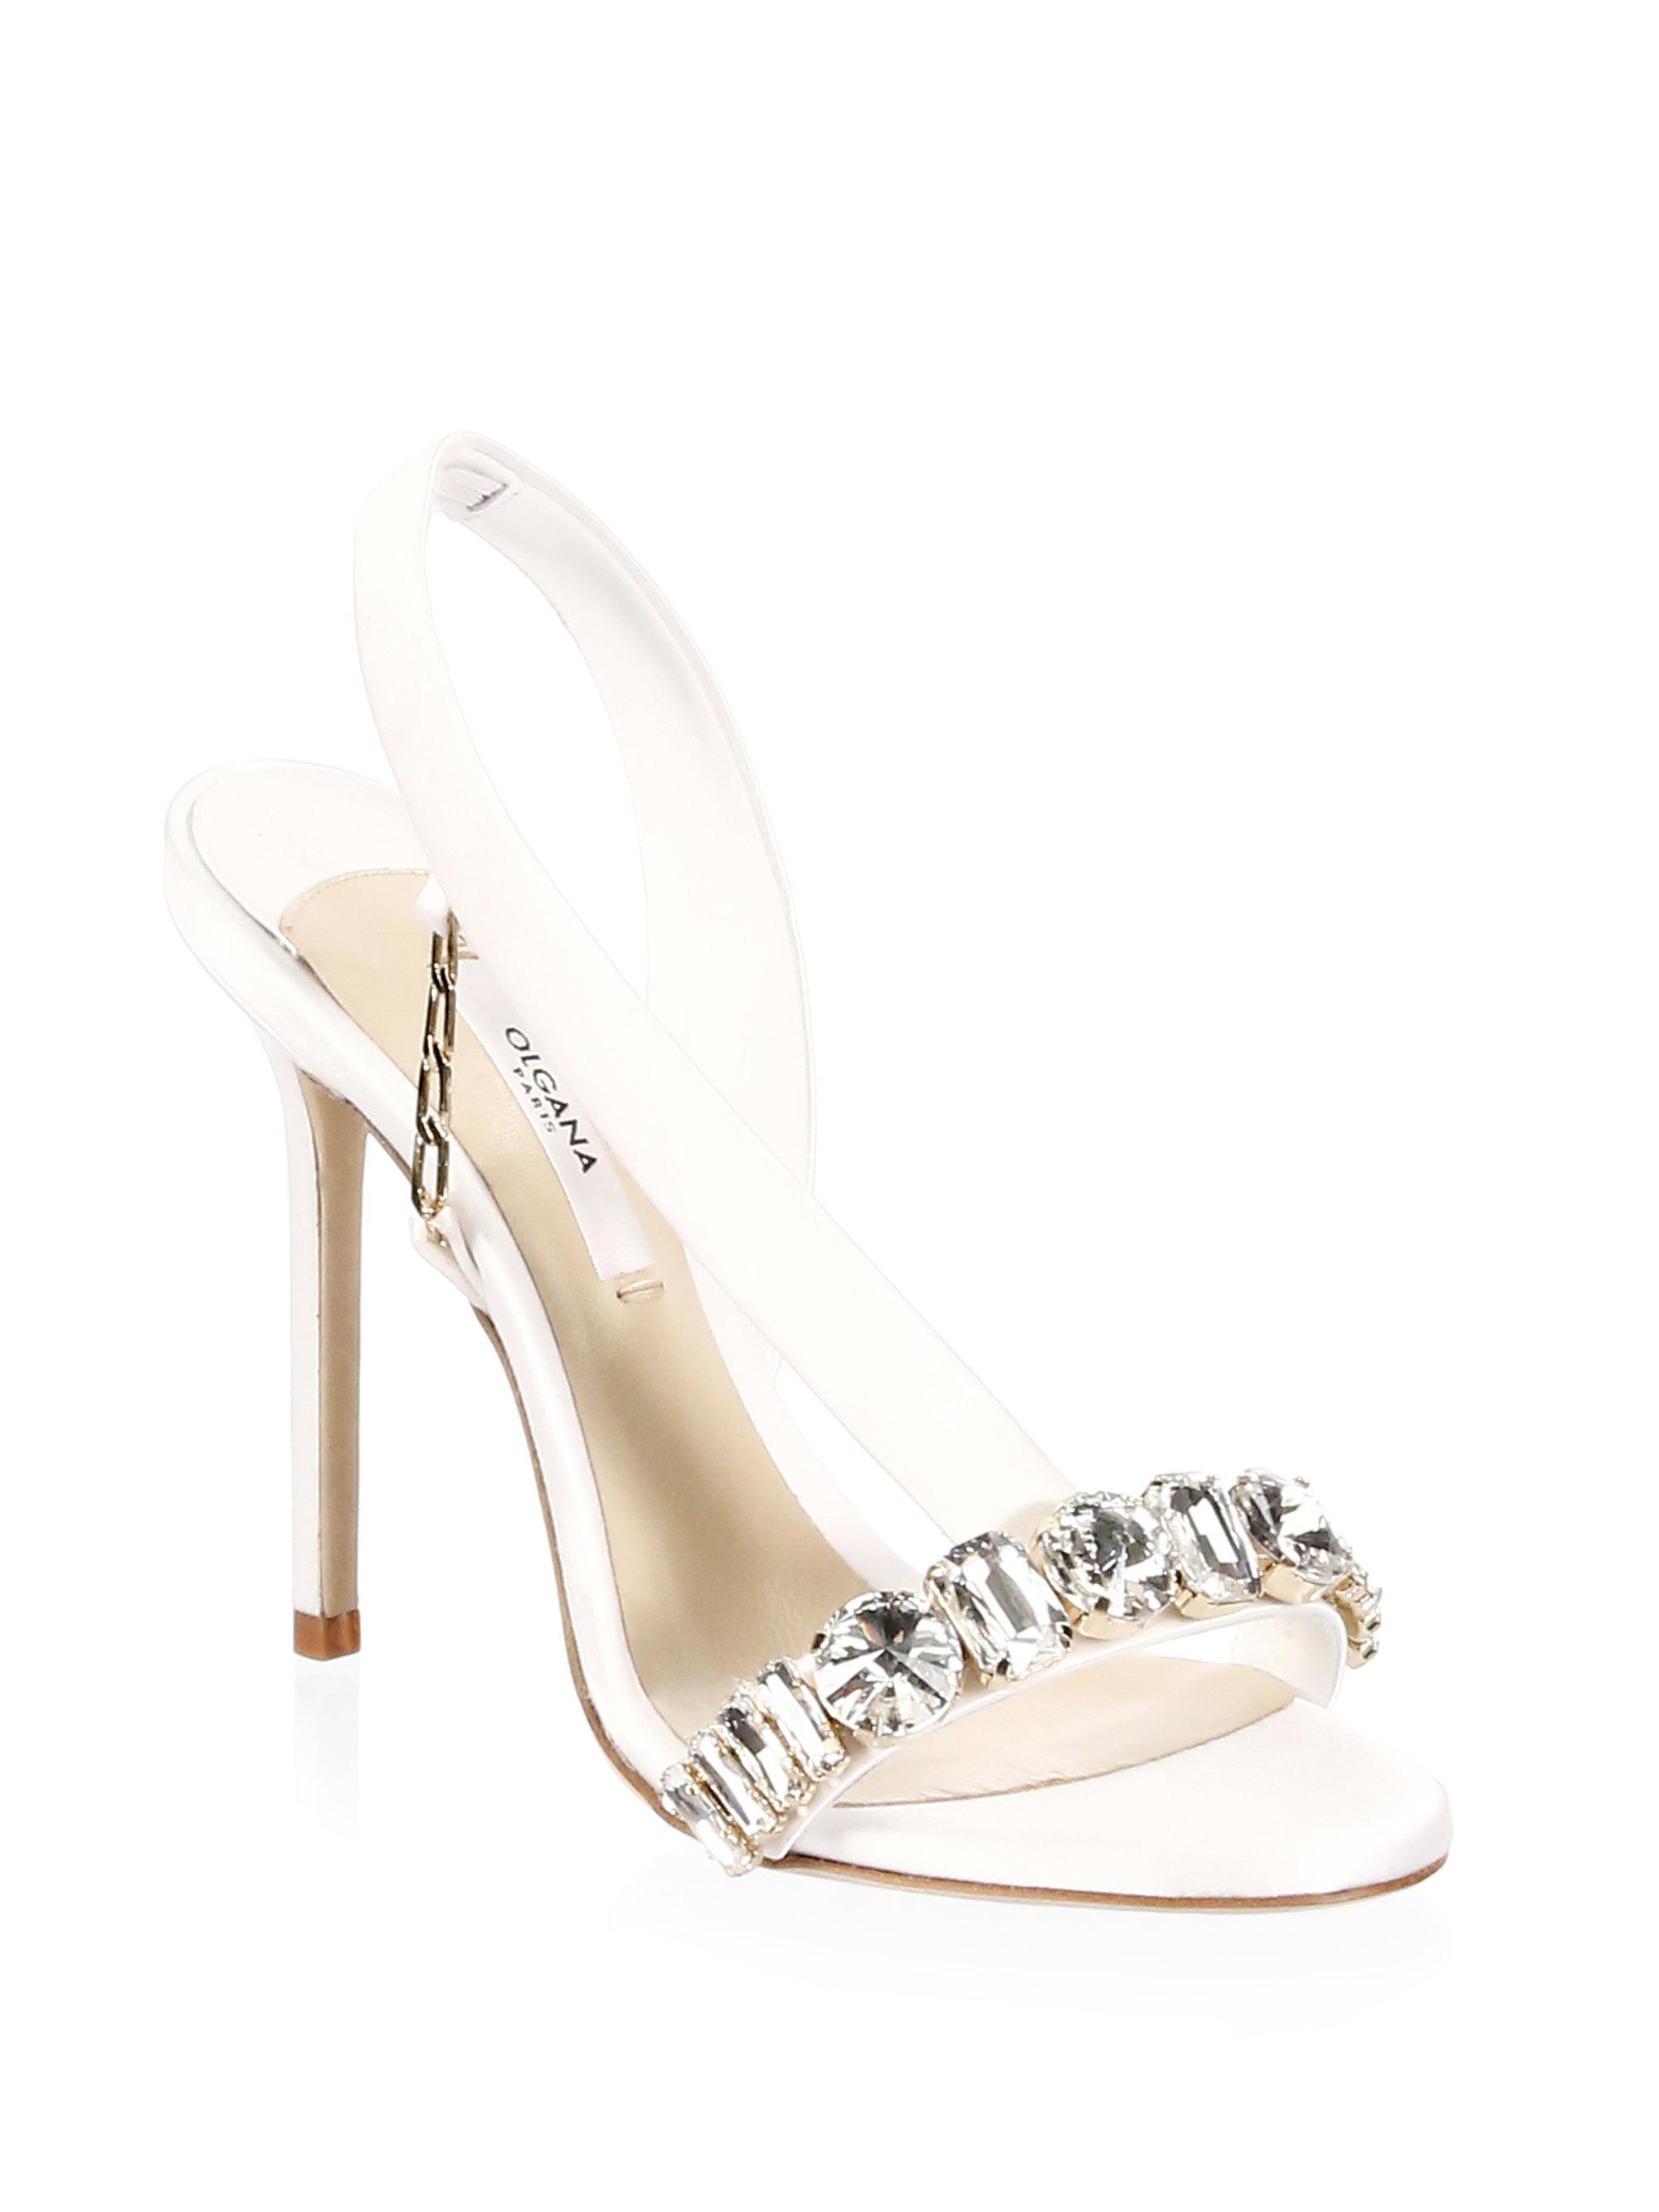 b28979382 Lyst - Olgana Paris Jeweled Satin Pumps in White